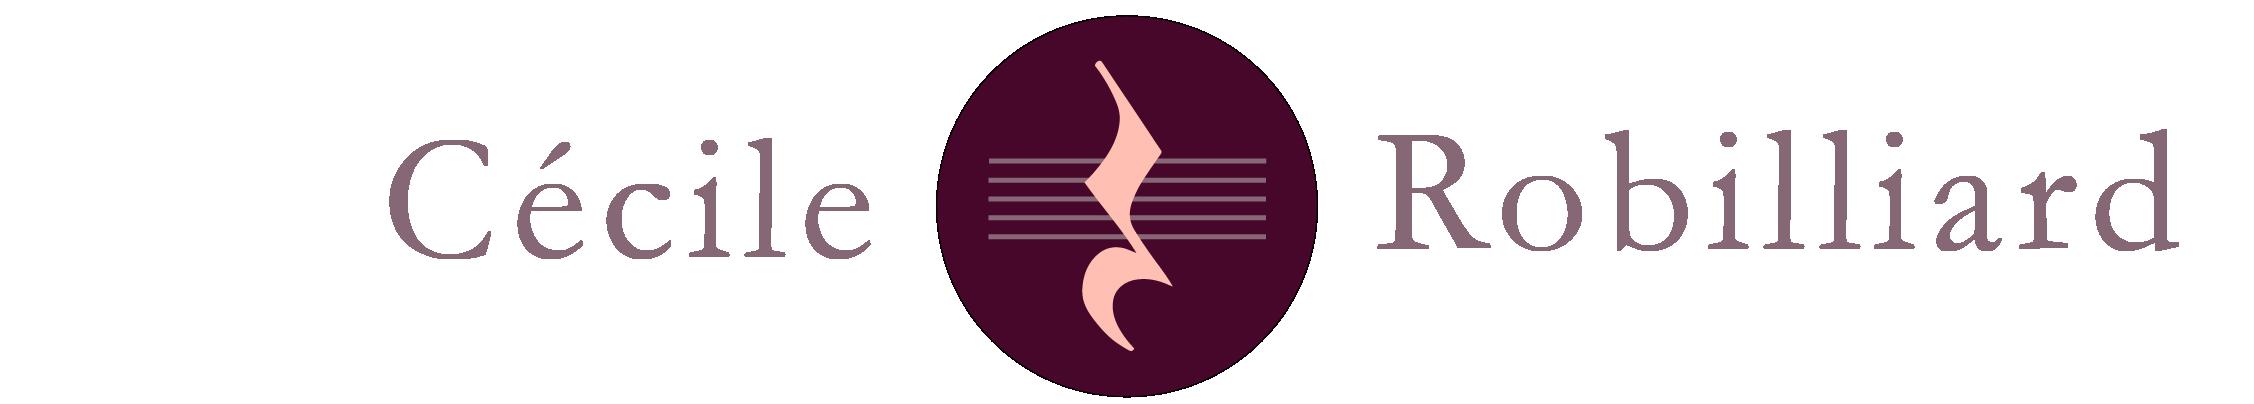 logo_cécile robilliard